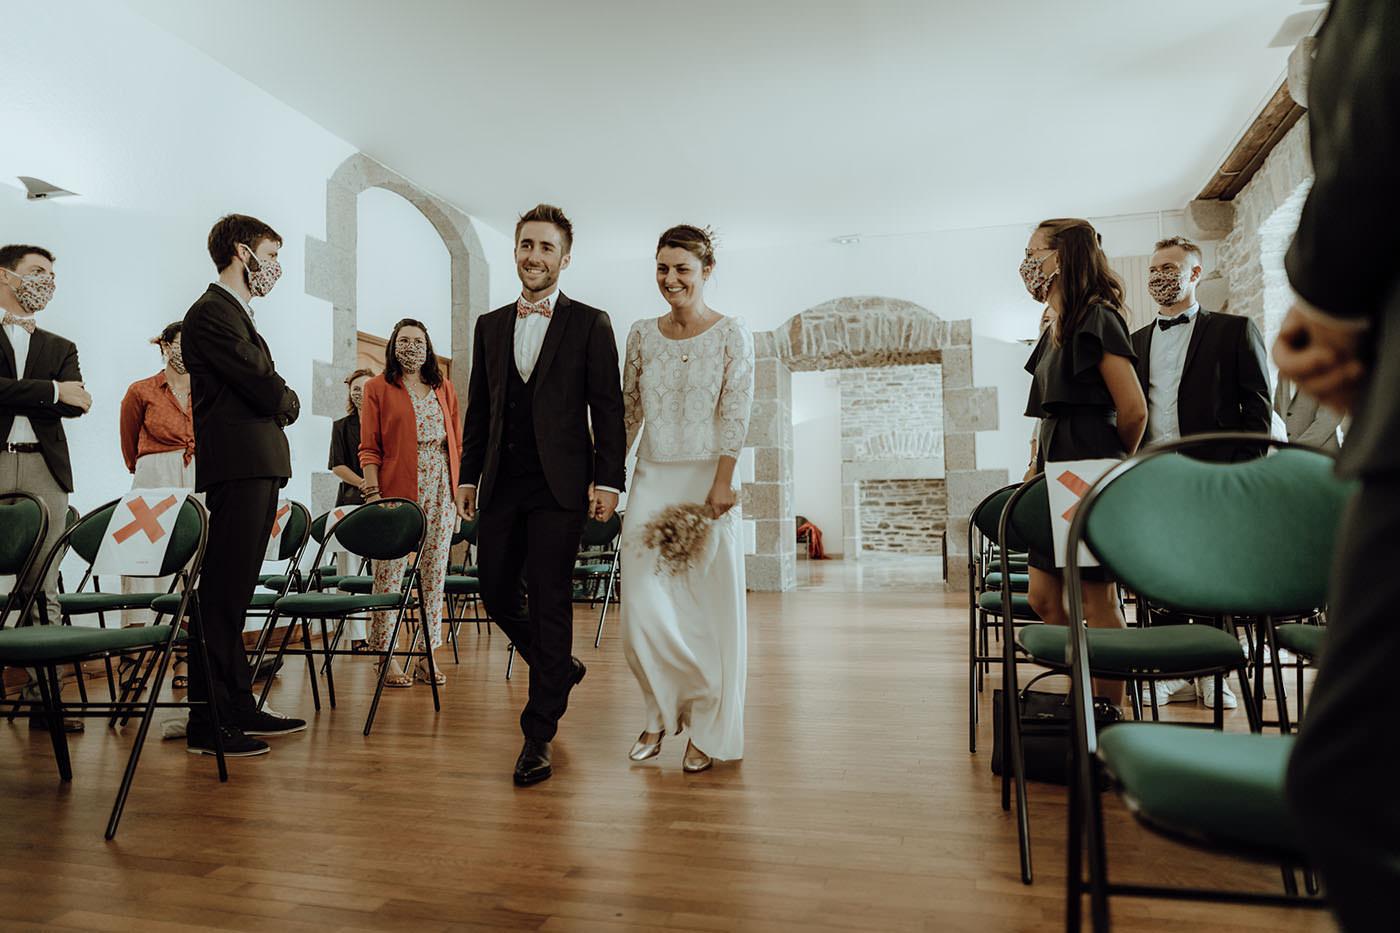 mariage mairie bretgane report mariage